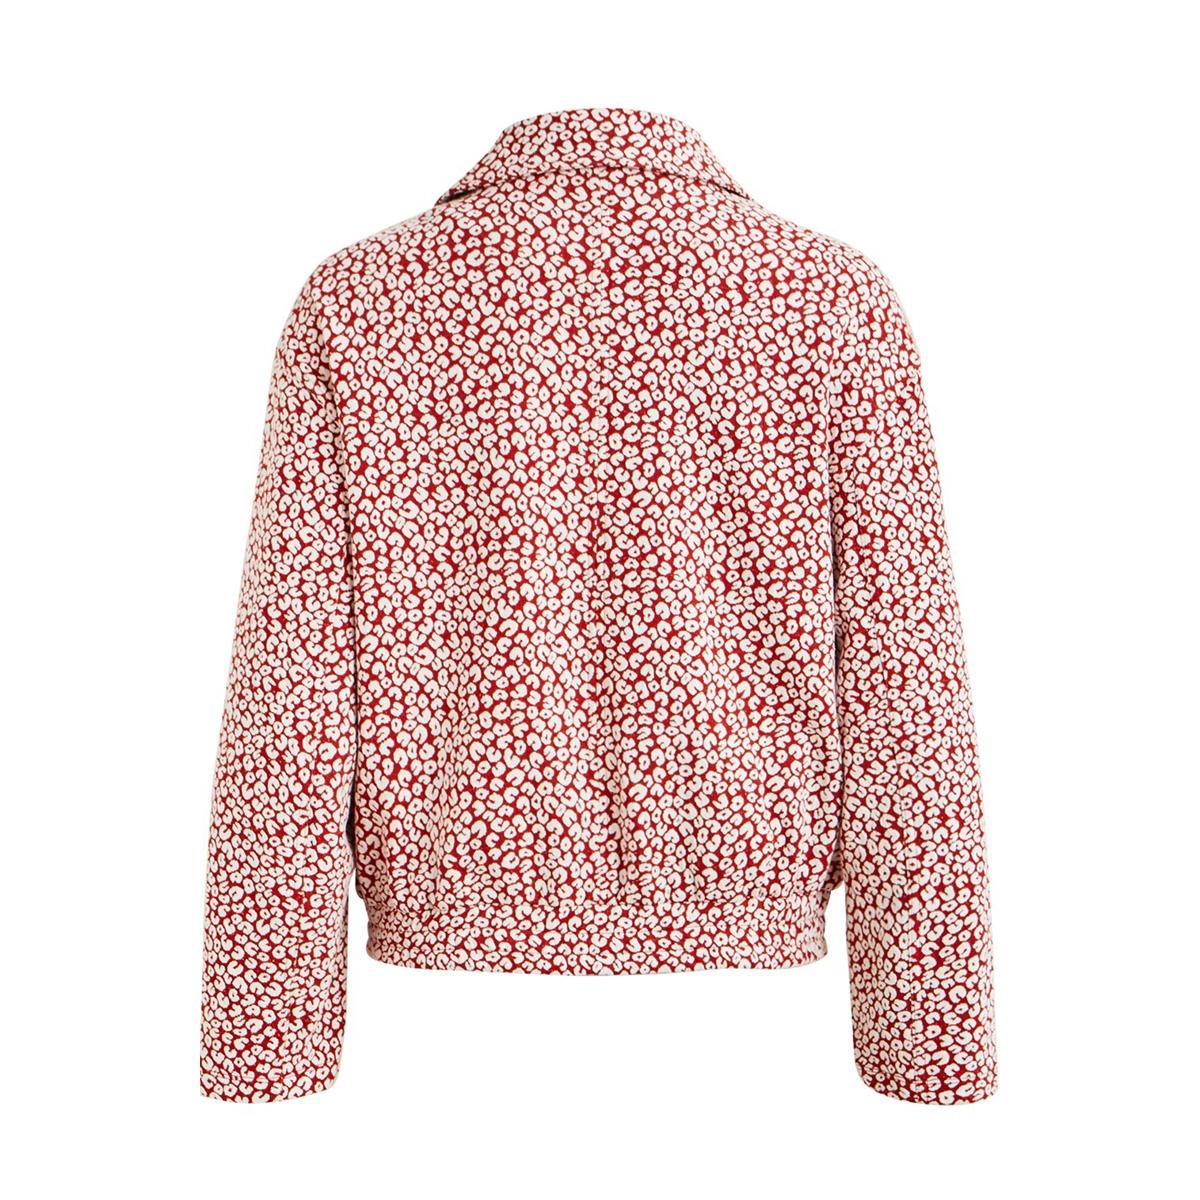 objelena sweat jacket 107 23031903 object jas tandori spice/white